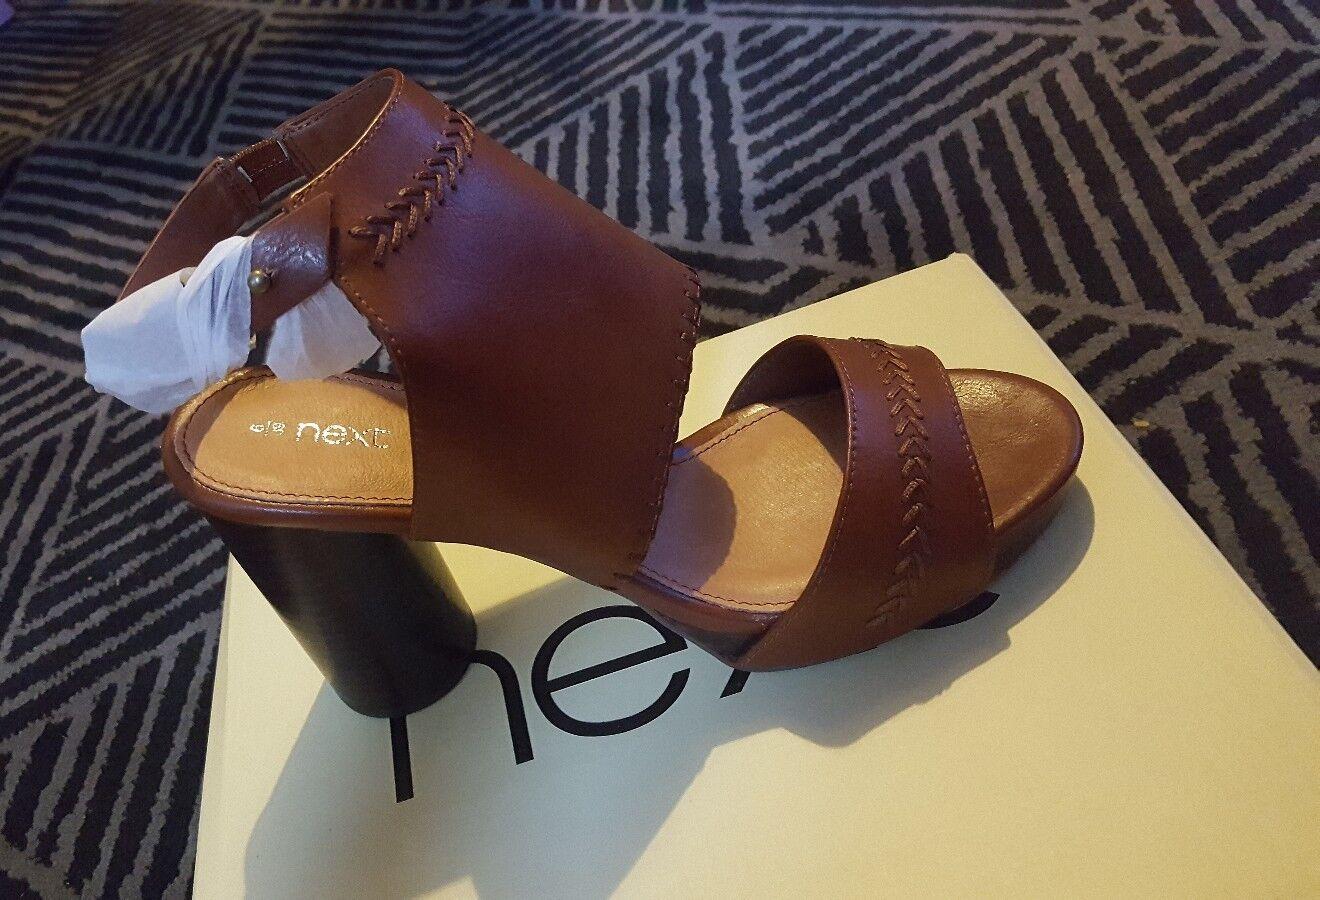 Tan roman sandle type from heels Größe 6 from type Next e8c8c8